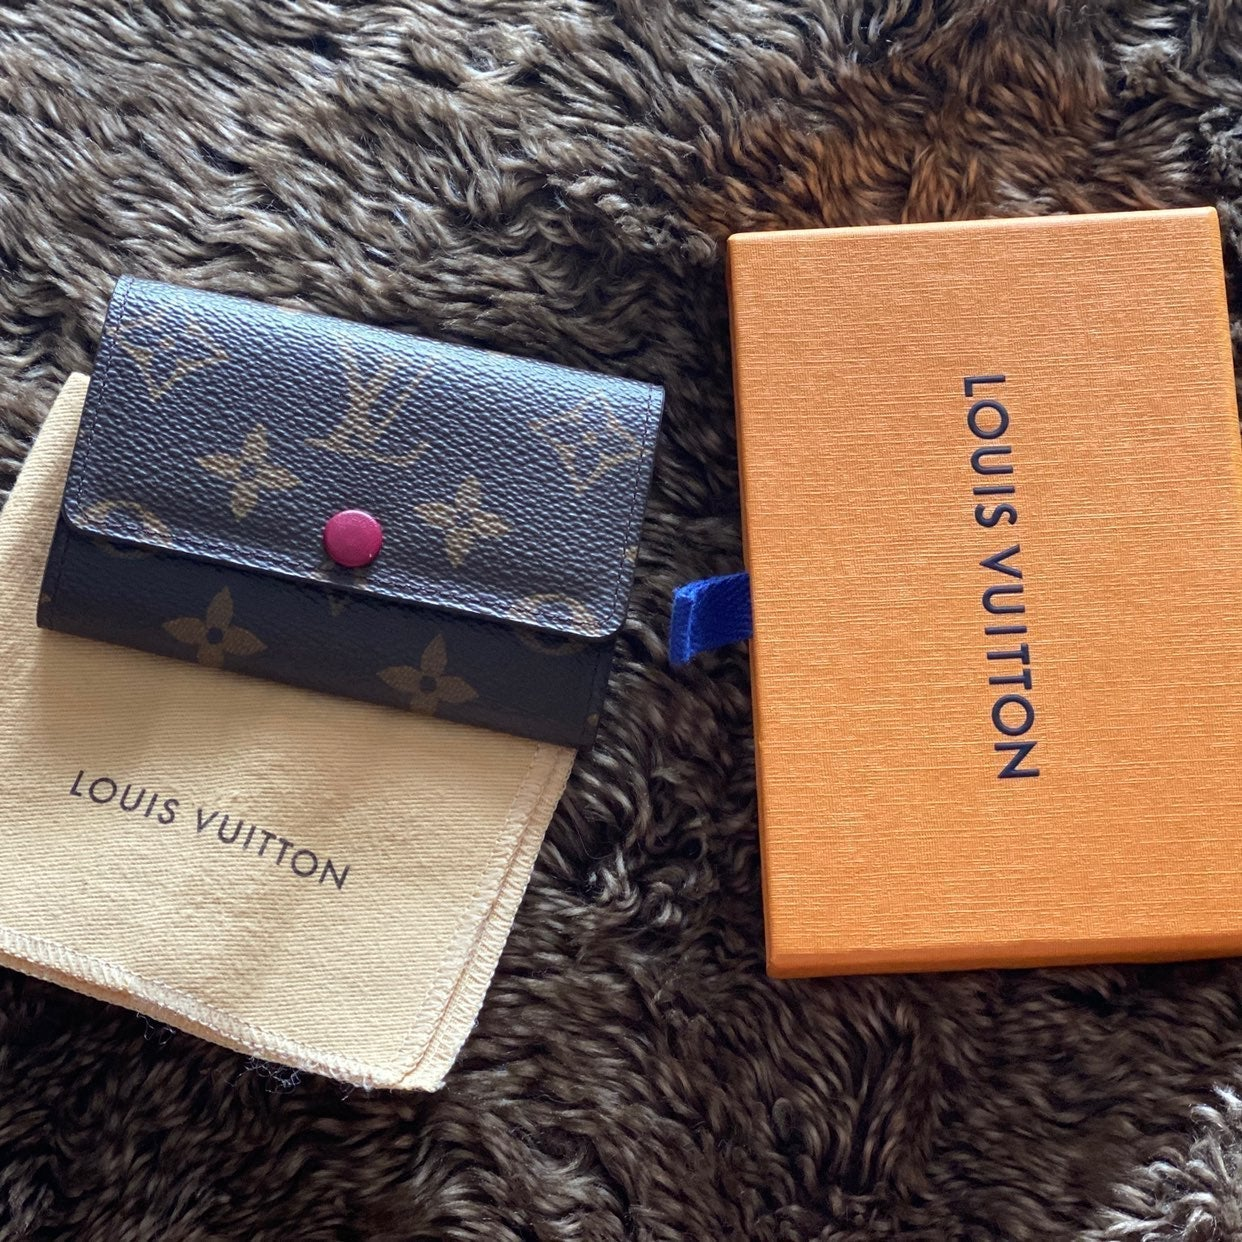 Louis Vuitton fuchsia 6 ring keyholder